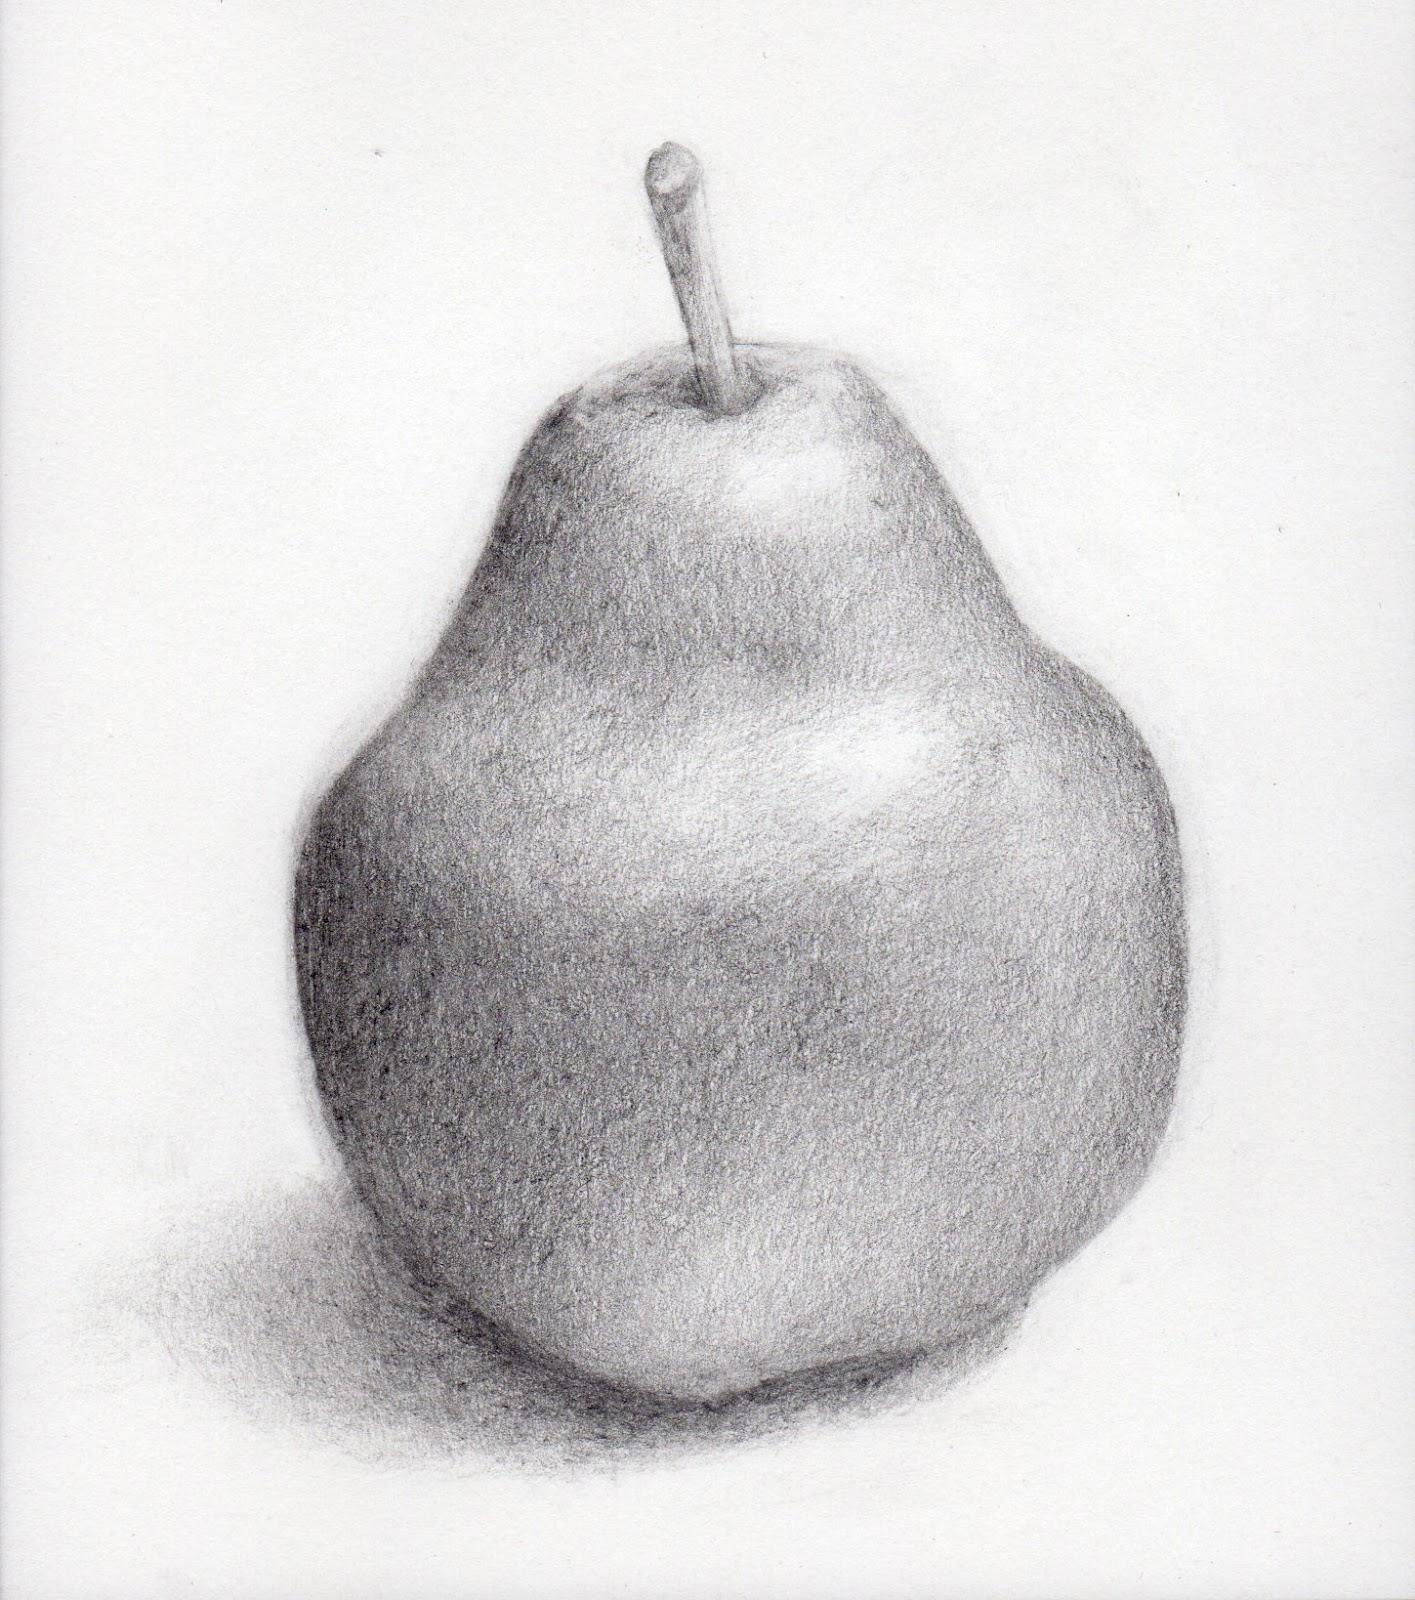 яблоко и груша картинки карандашом уютен любое